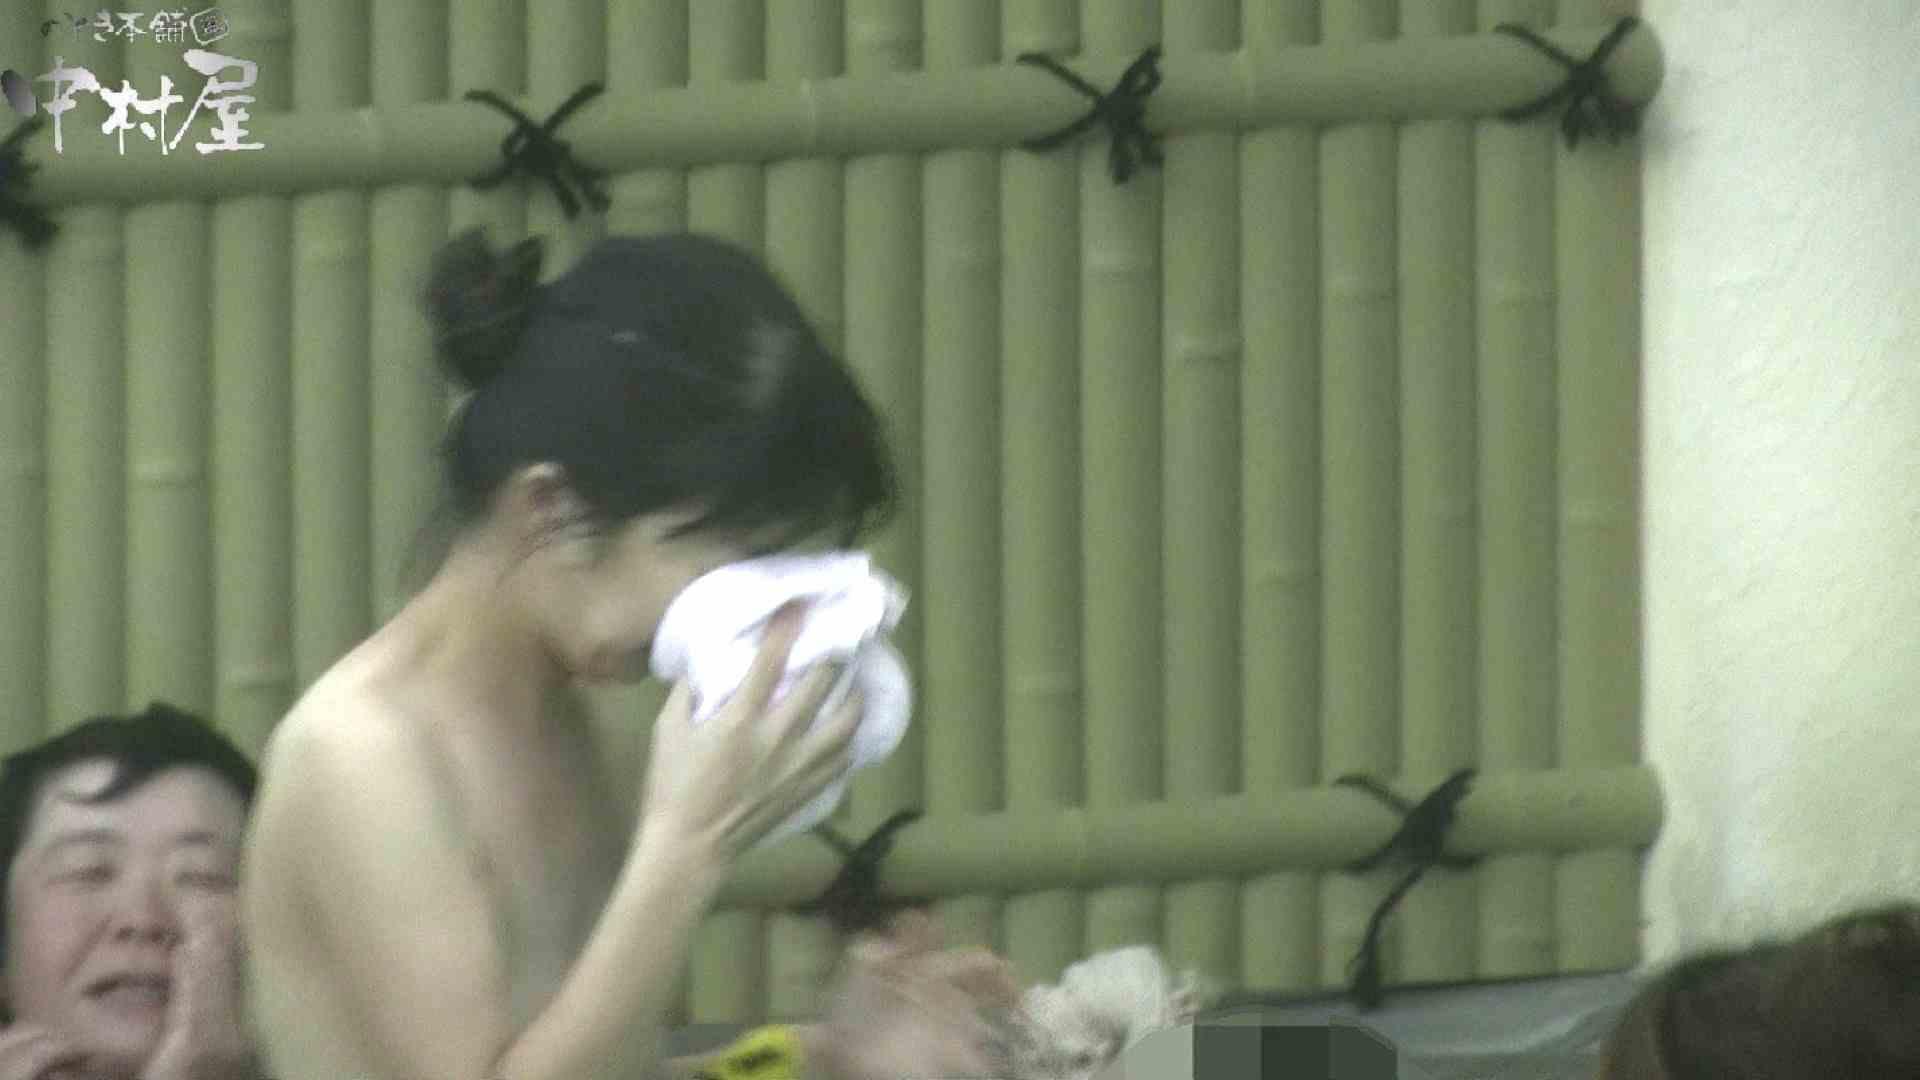 Aquaな露天風呂Vol.904 OL女体 アダルト動画キャプチャ 85連発 38